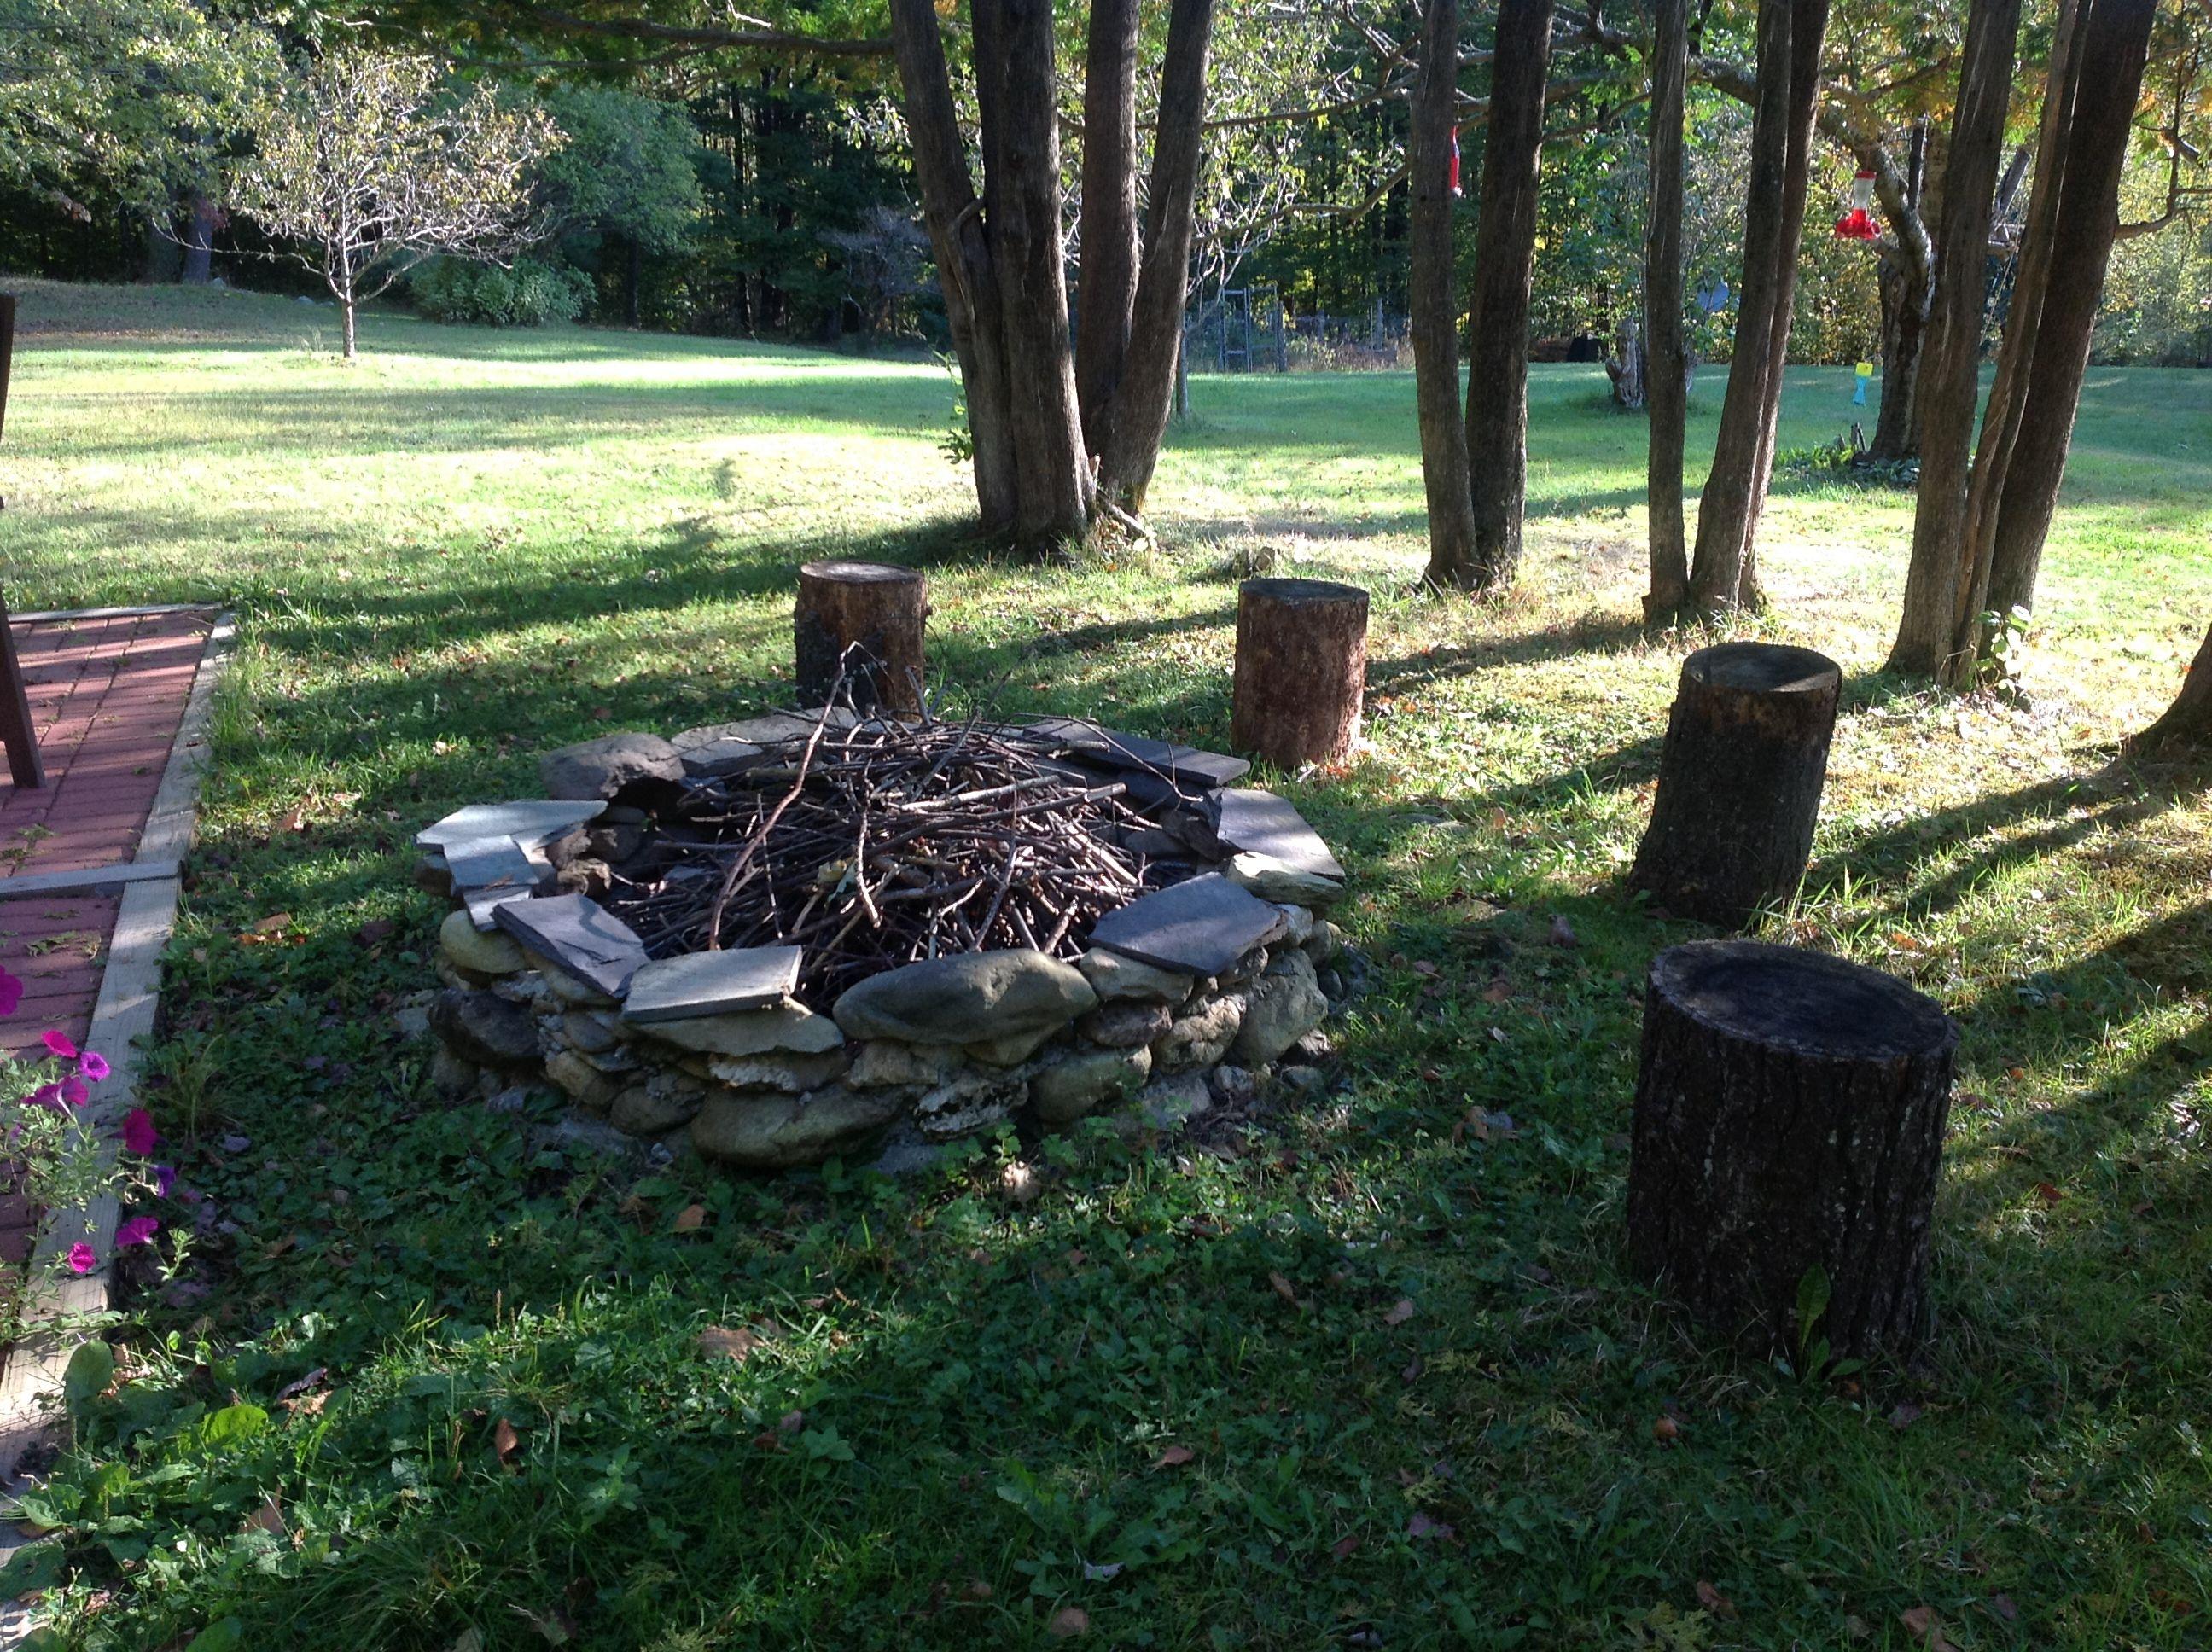 Tree Stump Seats Outdoor Stone Fireplace With Tree Stump Seats M J Vt House